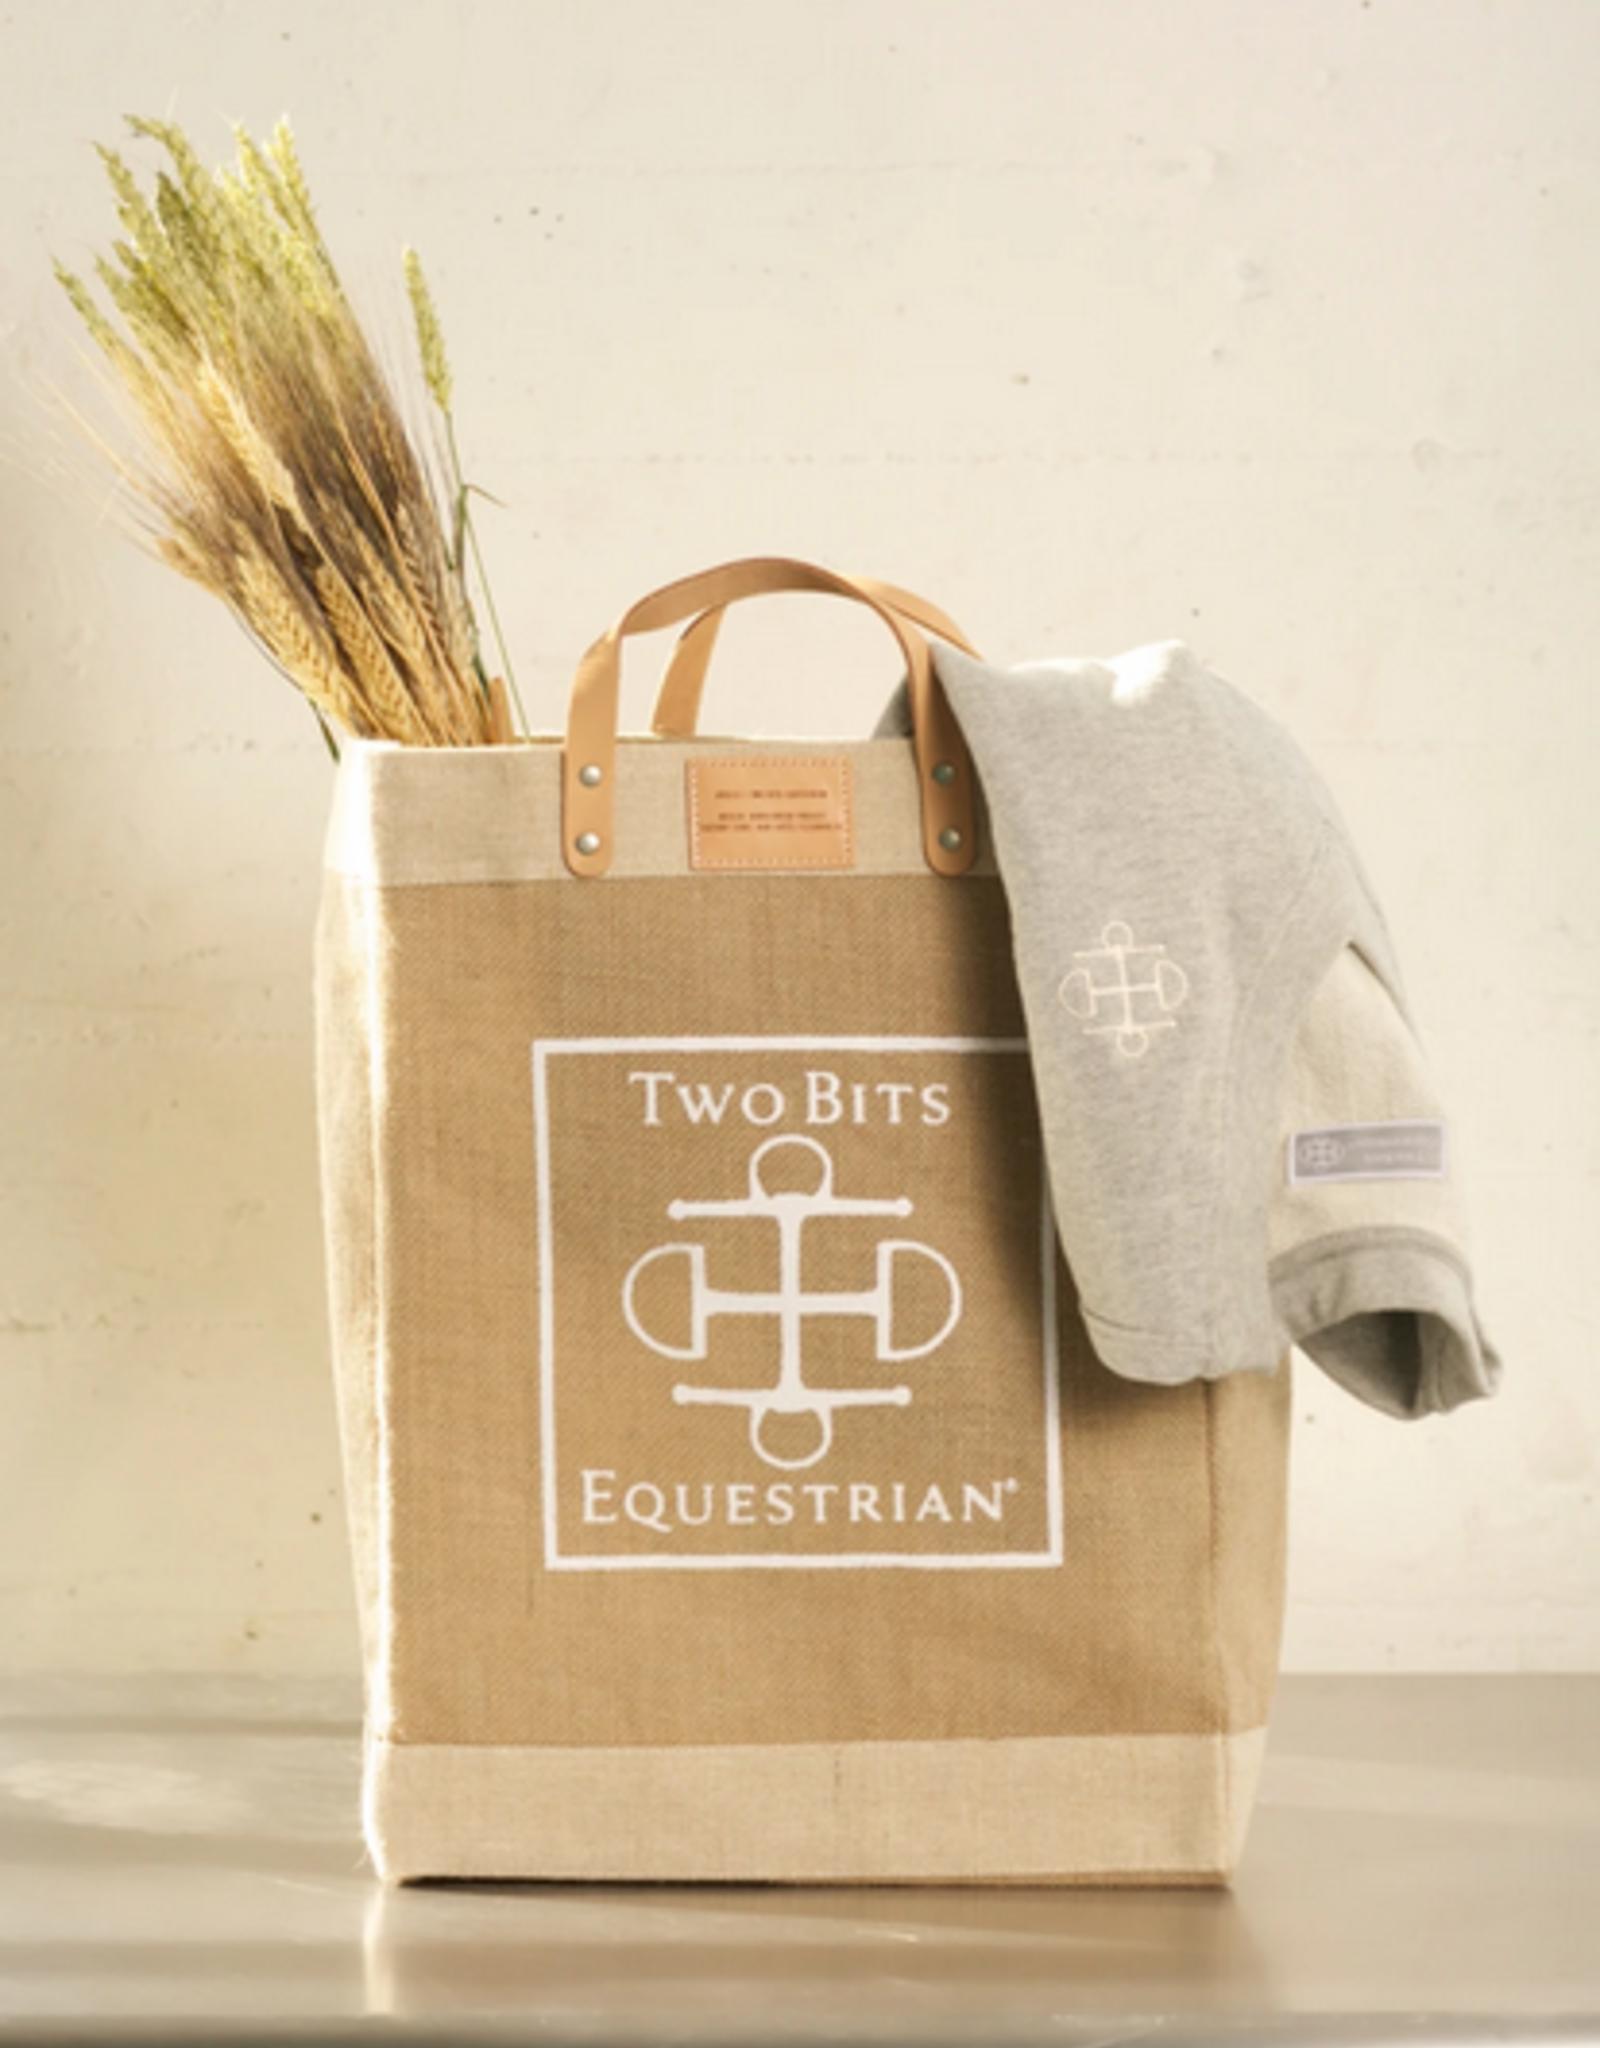 Two Bits Equestrian Two Bits Equestrian x Apolis Shopper